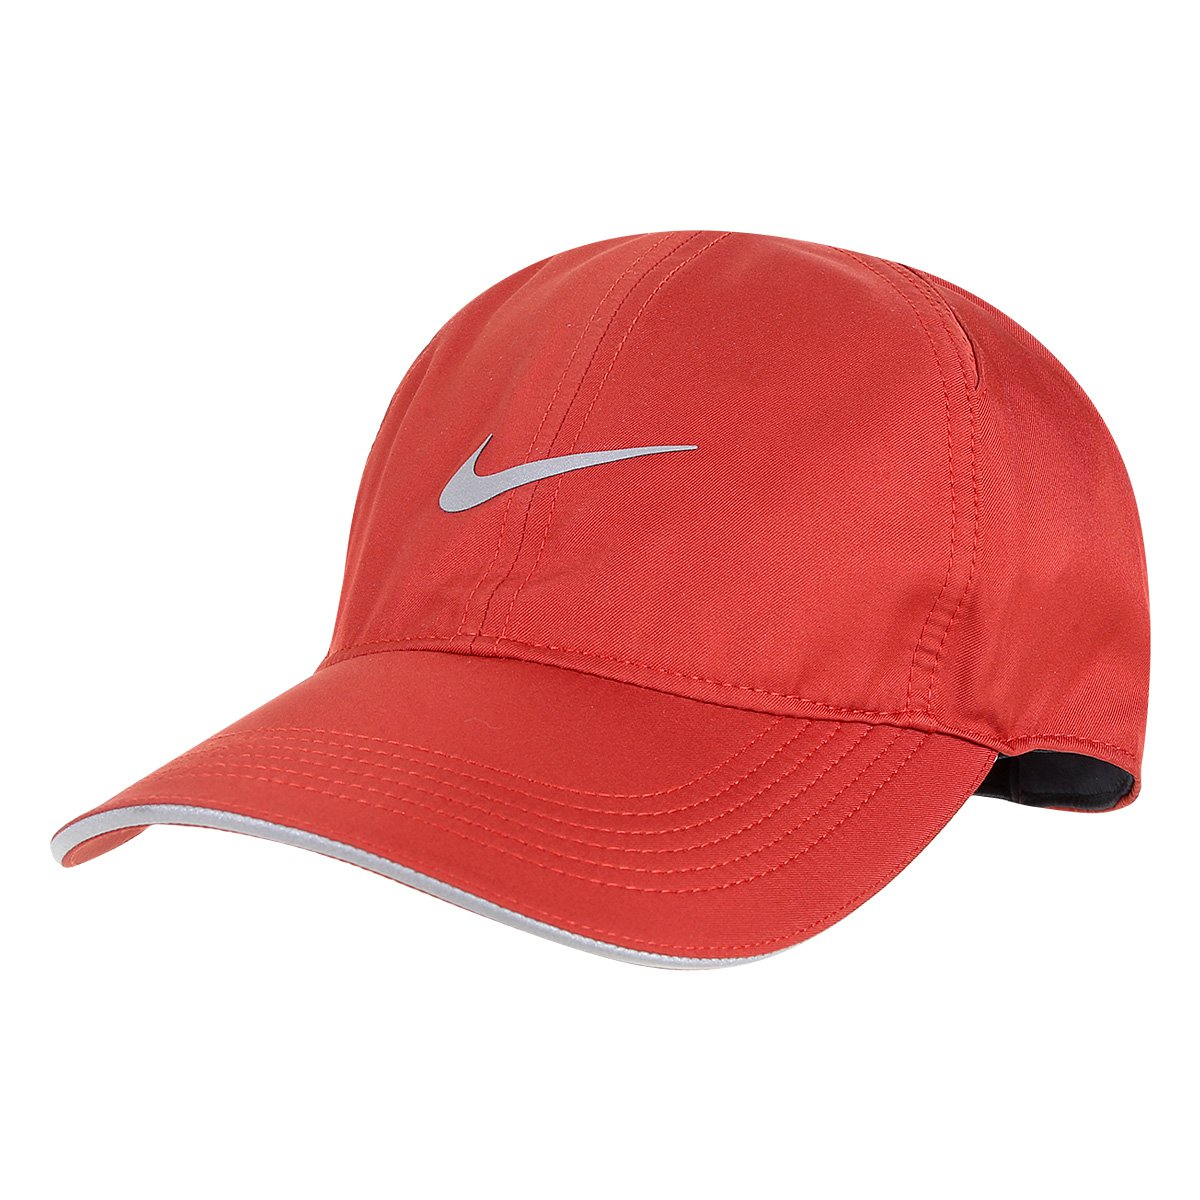 0b47823b7e37d Boné Nike Aba Curva Featherlight Run